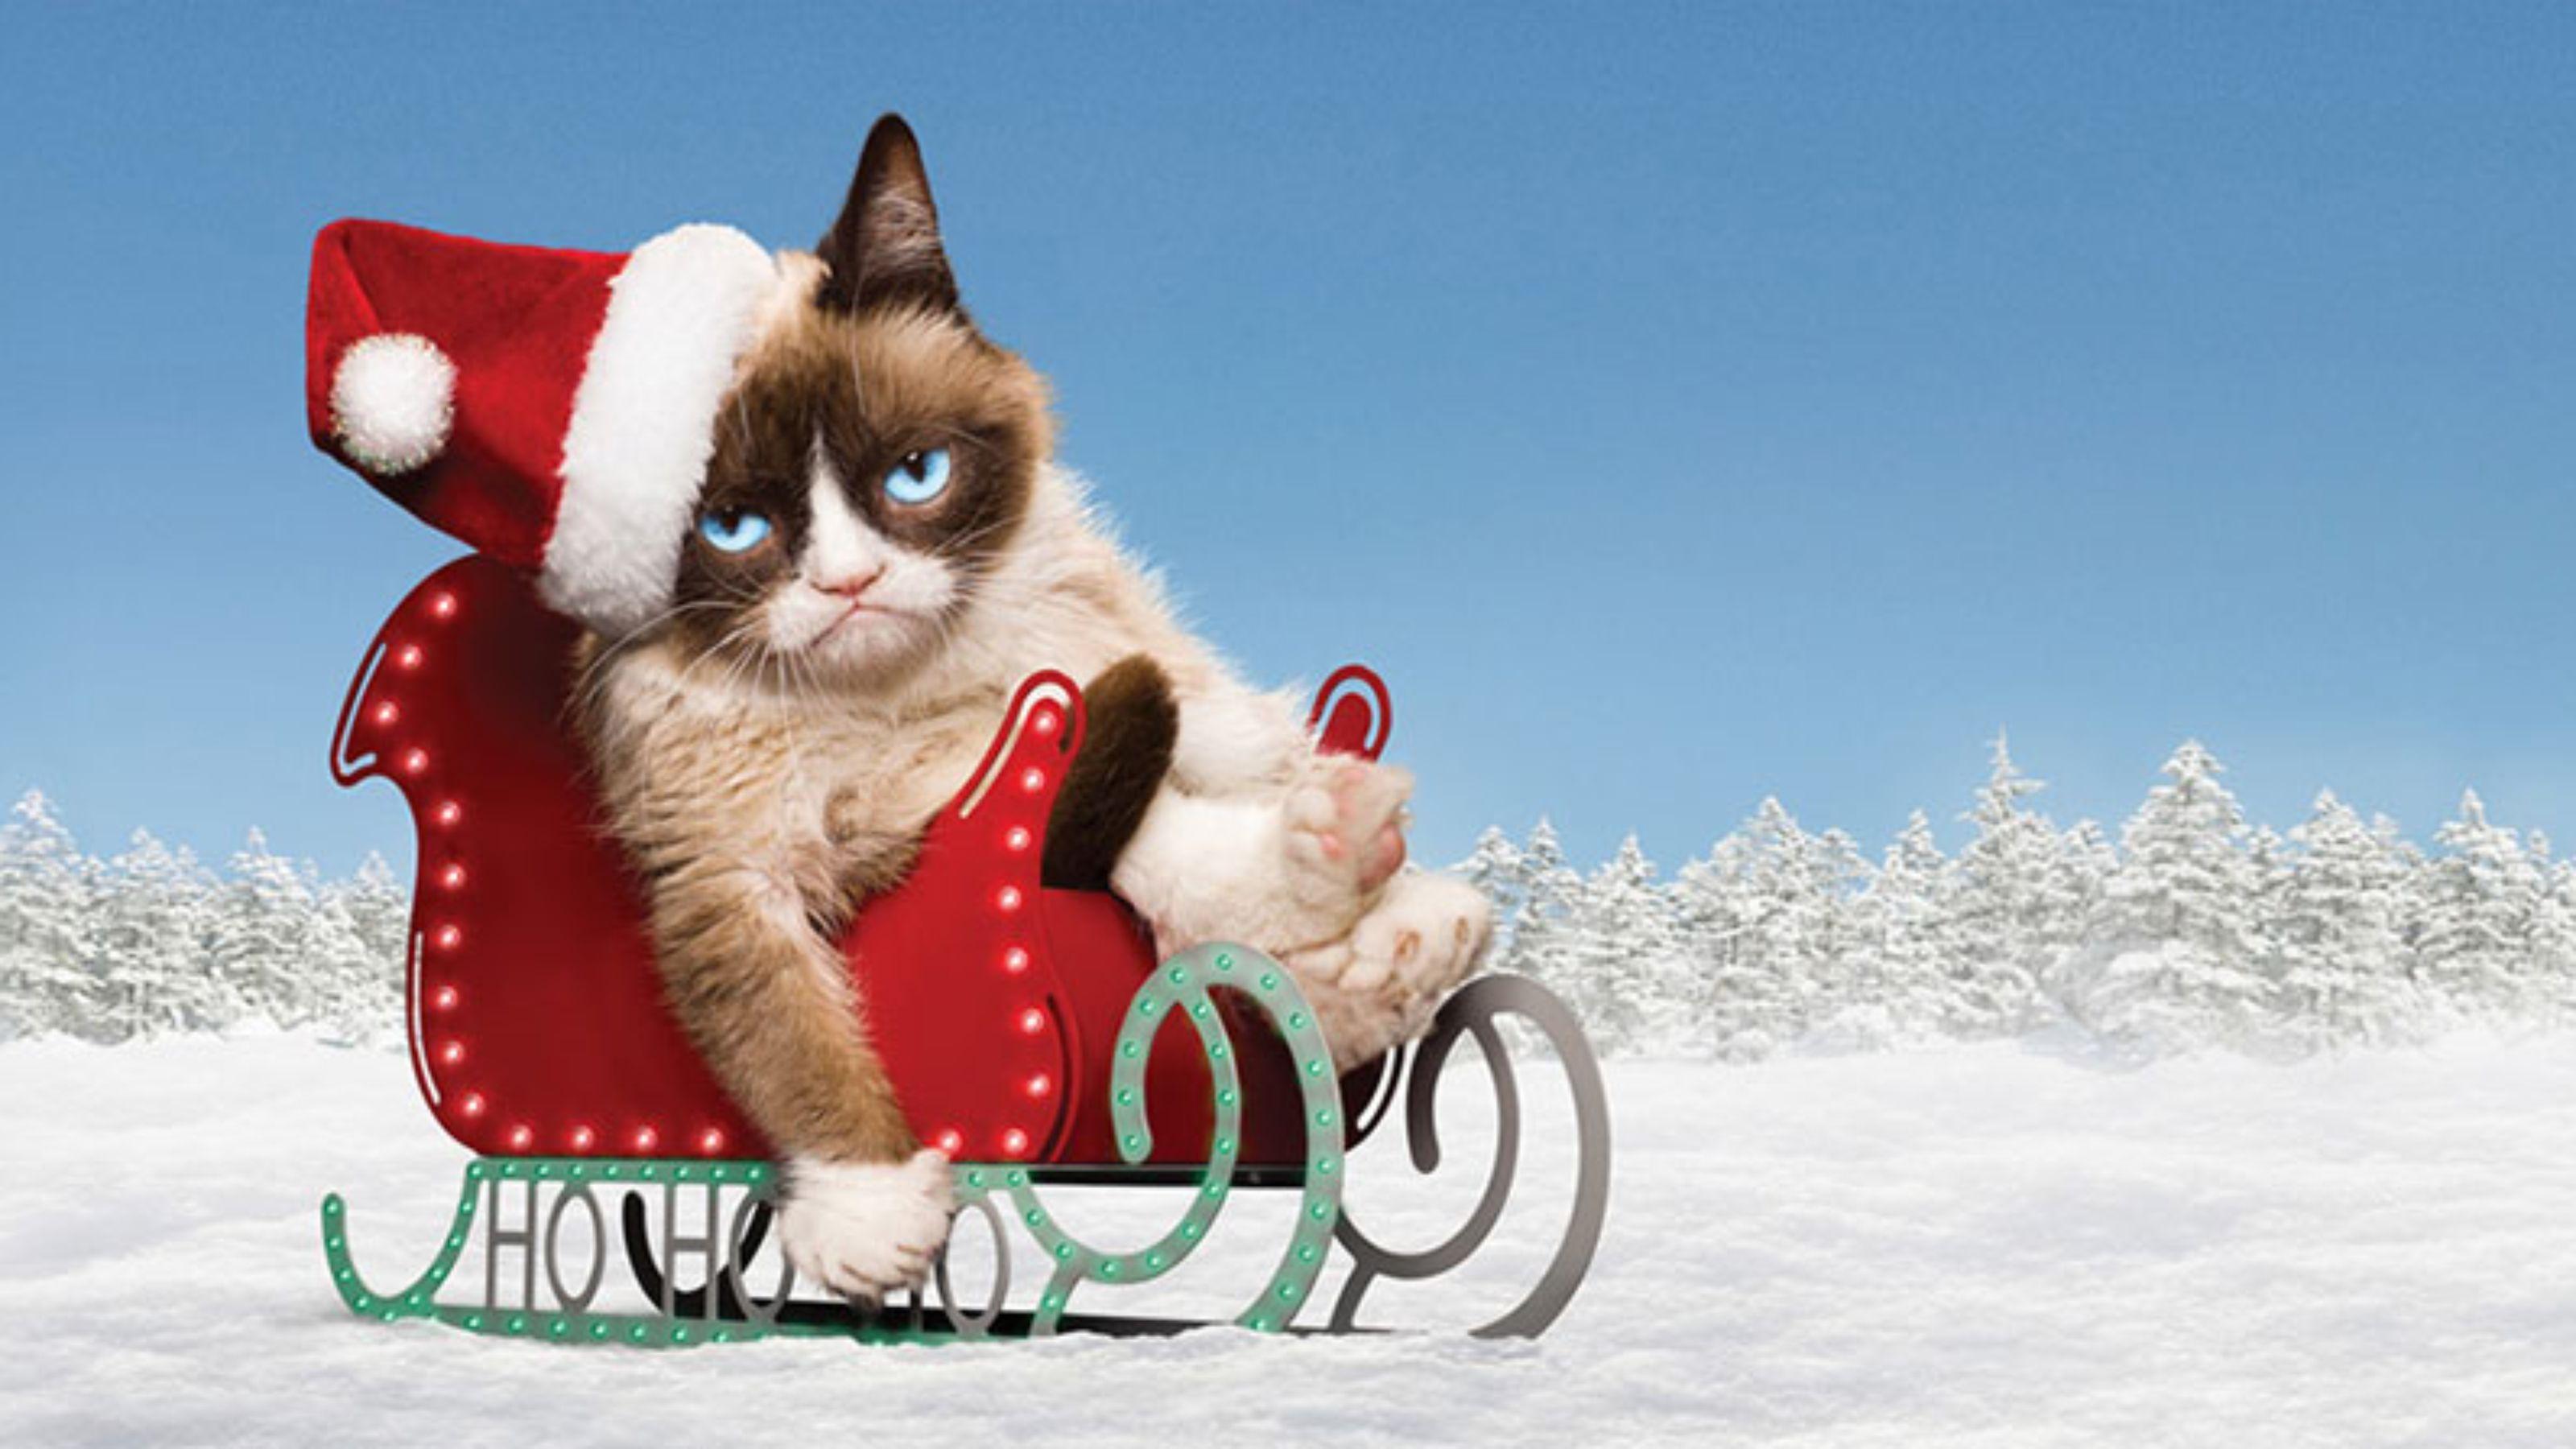 Grumpy Cat Wallpapers - Top Free Grumpy Cat Backgrounds ...